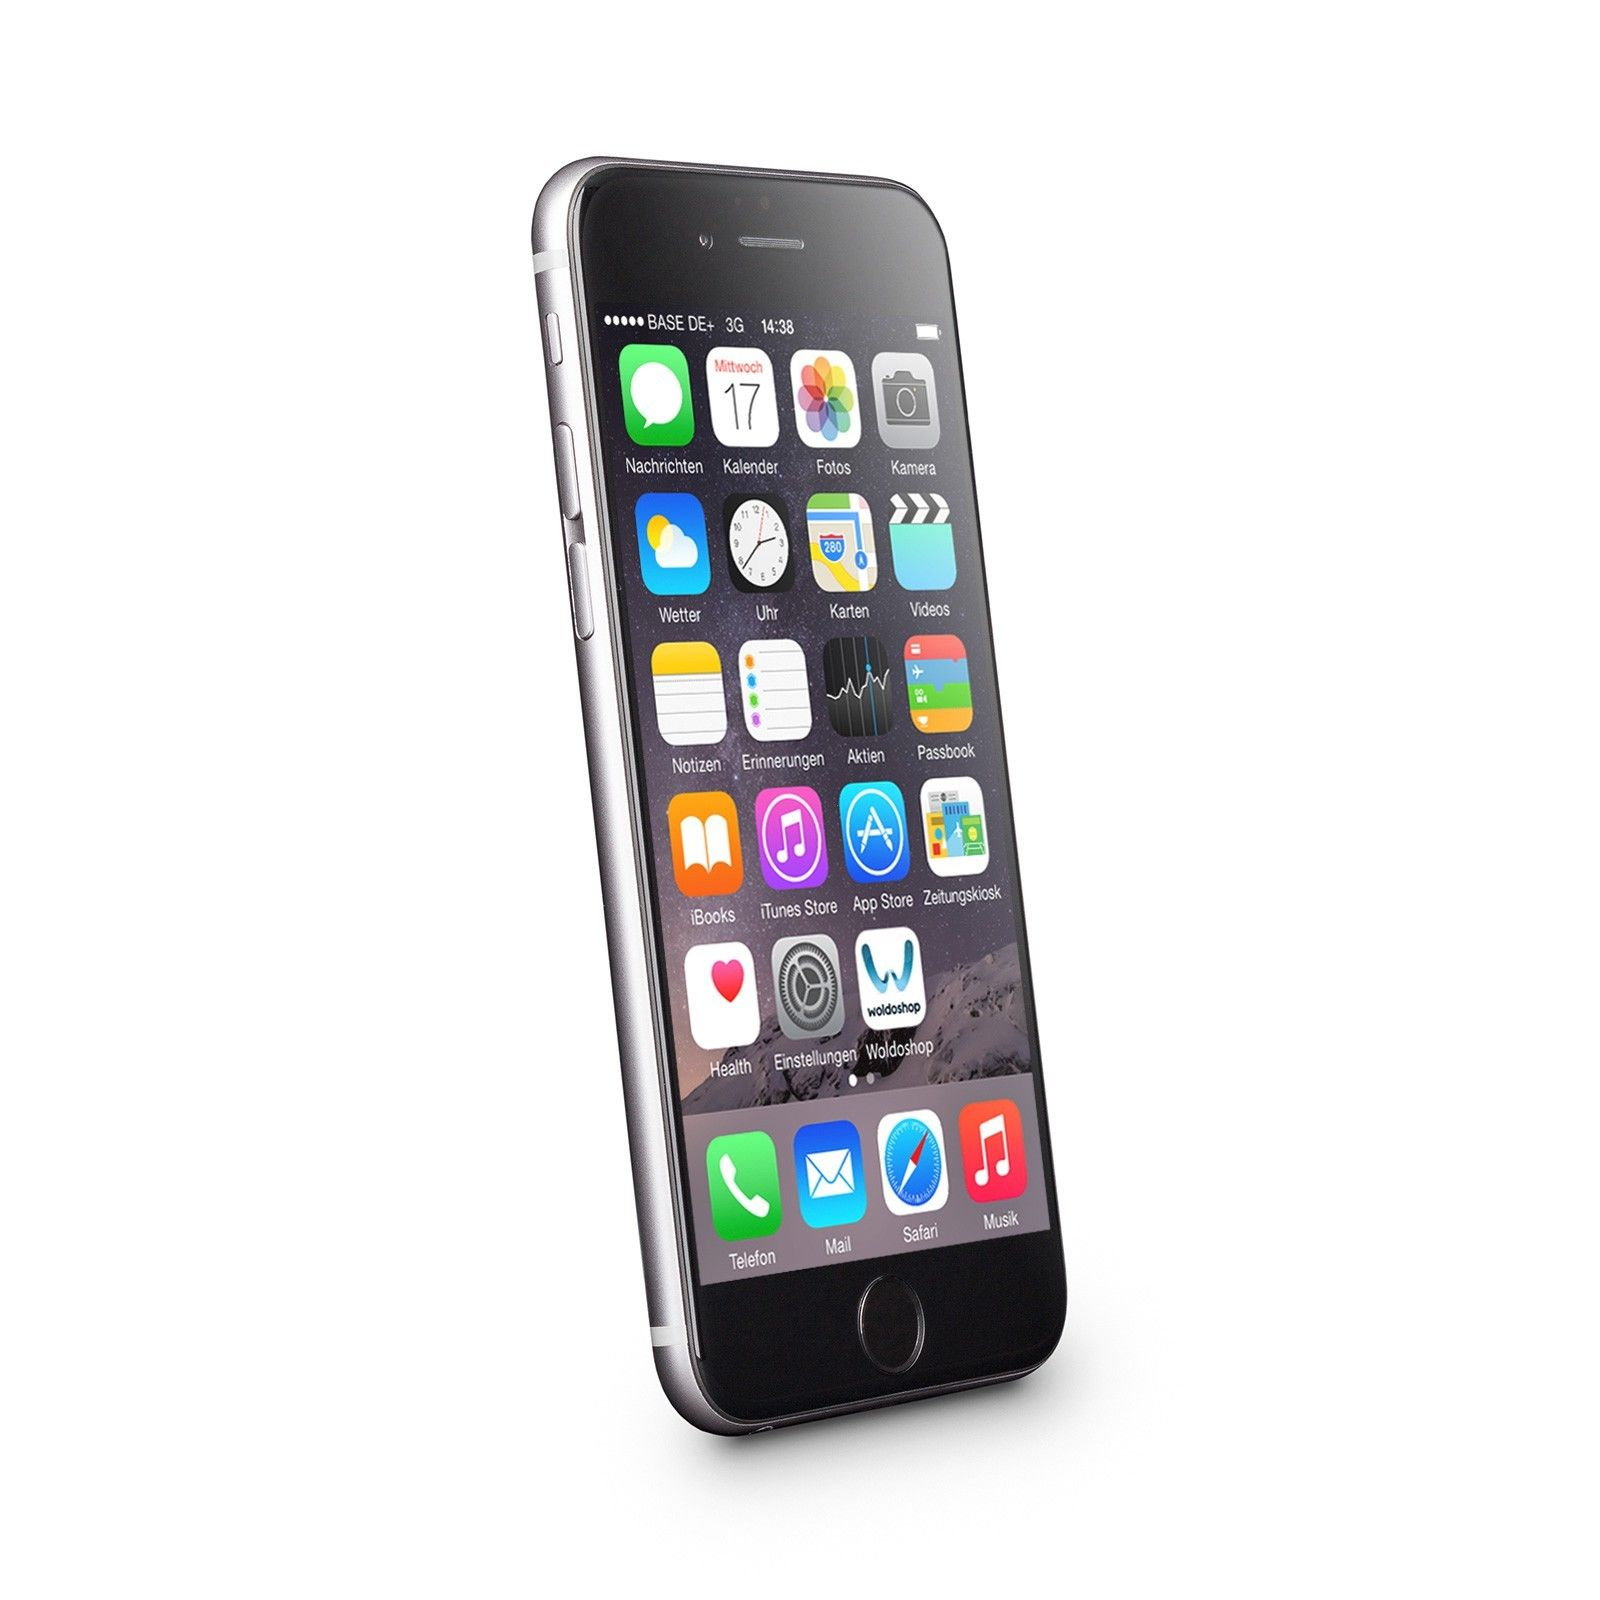 Apple iPhone 6 Plus 16GB Spacegrey Ohne Simlock Ohne Vertrag Smartphone K2